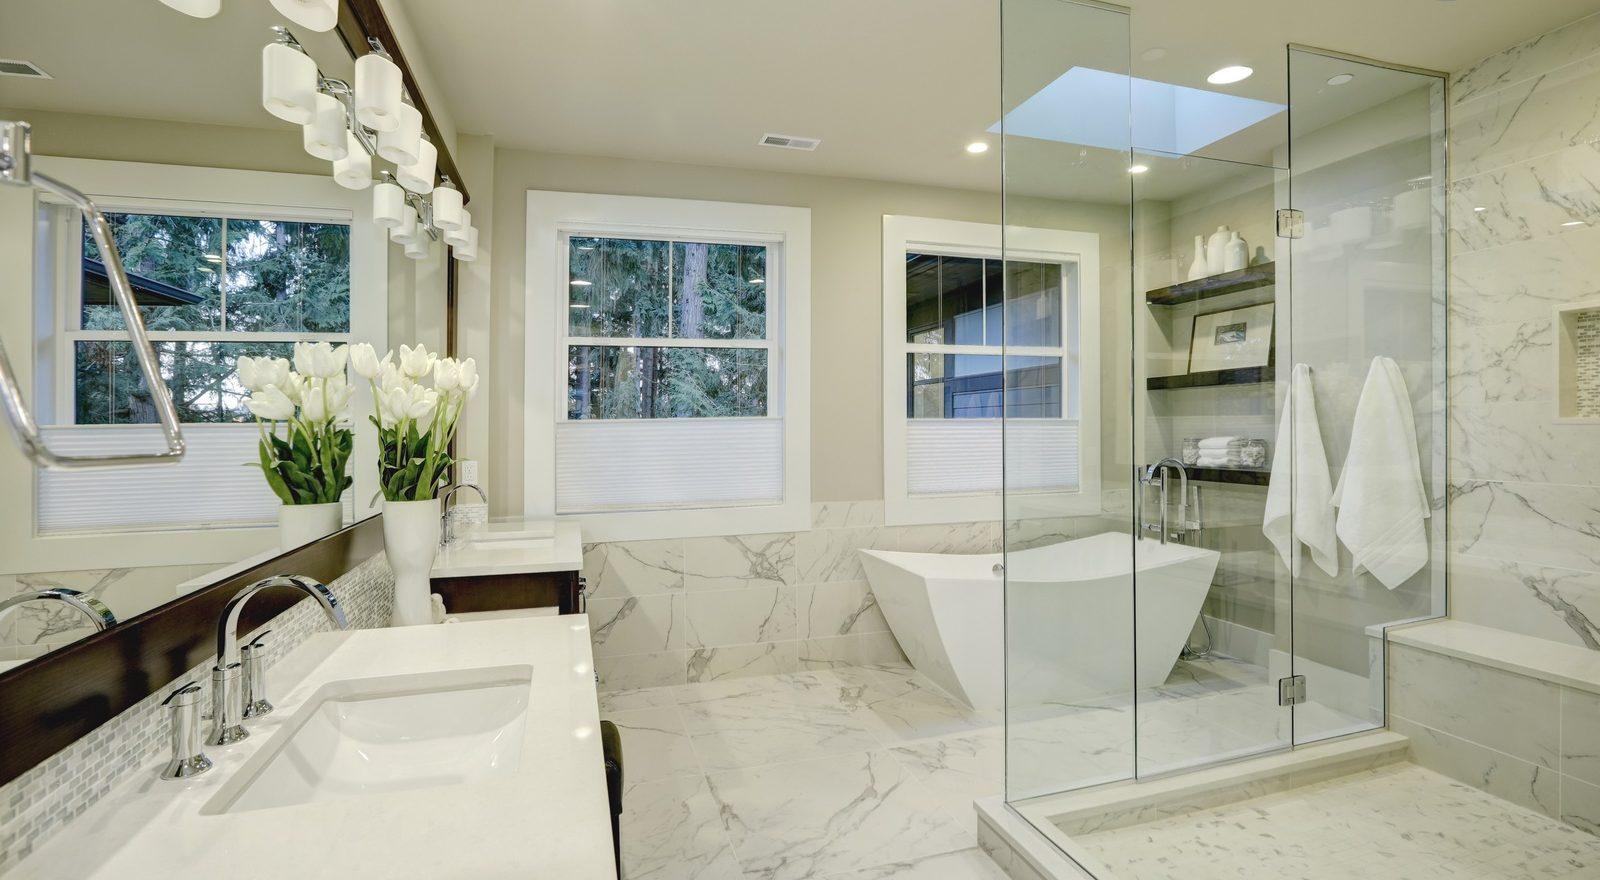 epoxy-metallique-salle-de-bain.jpeg